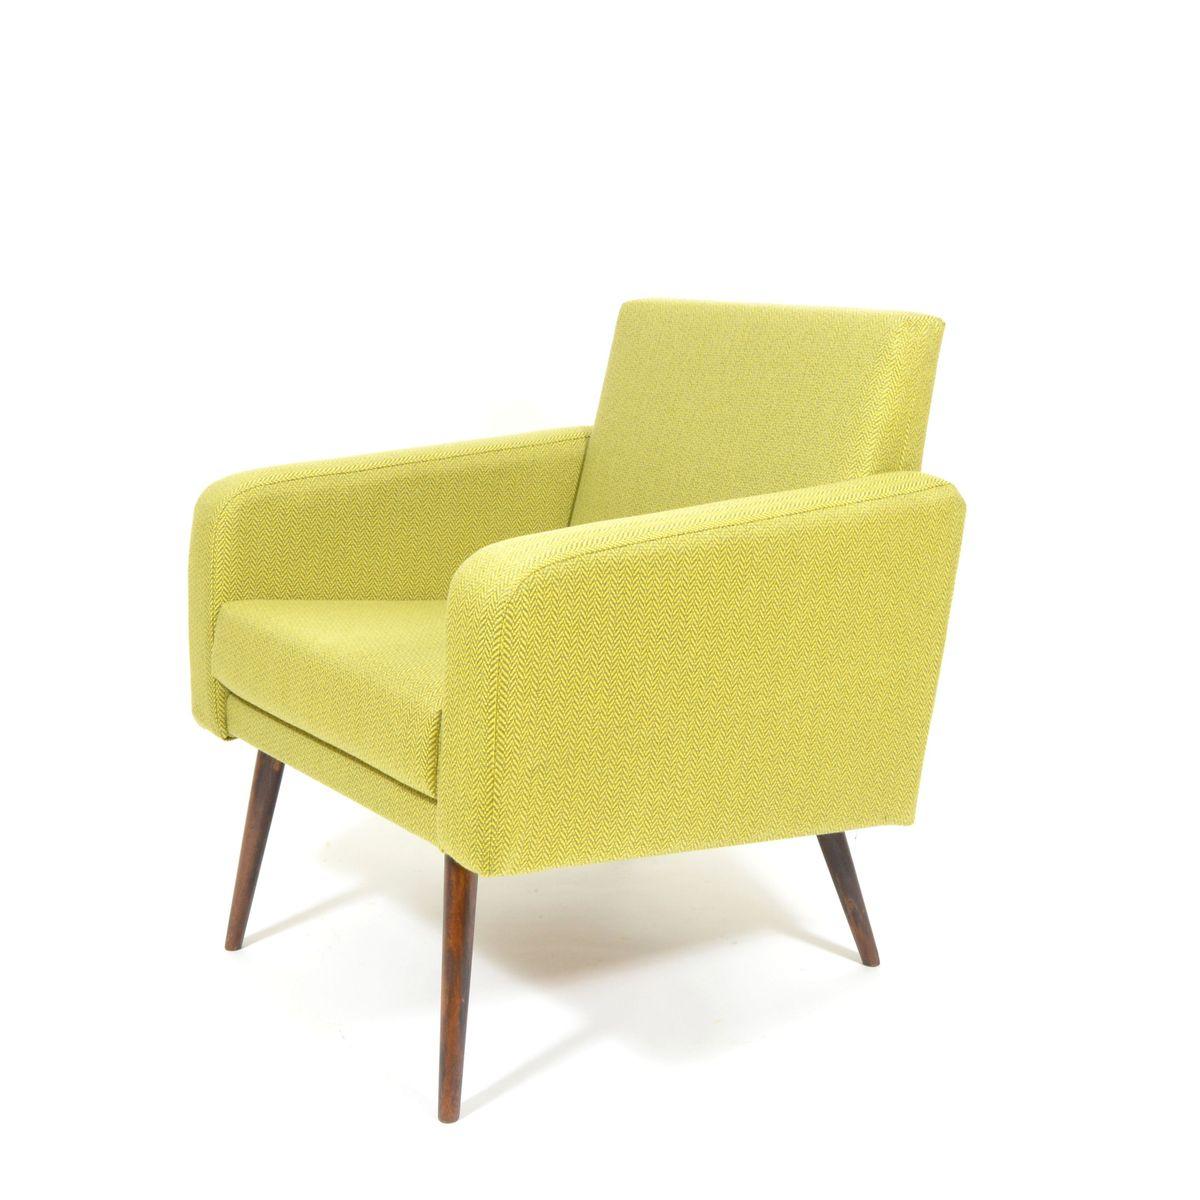 tschechischer lindgr ner vintage sessel bei pamono kaufen. Black Bedroom Furniture Sets. Home Design Ideas